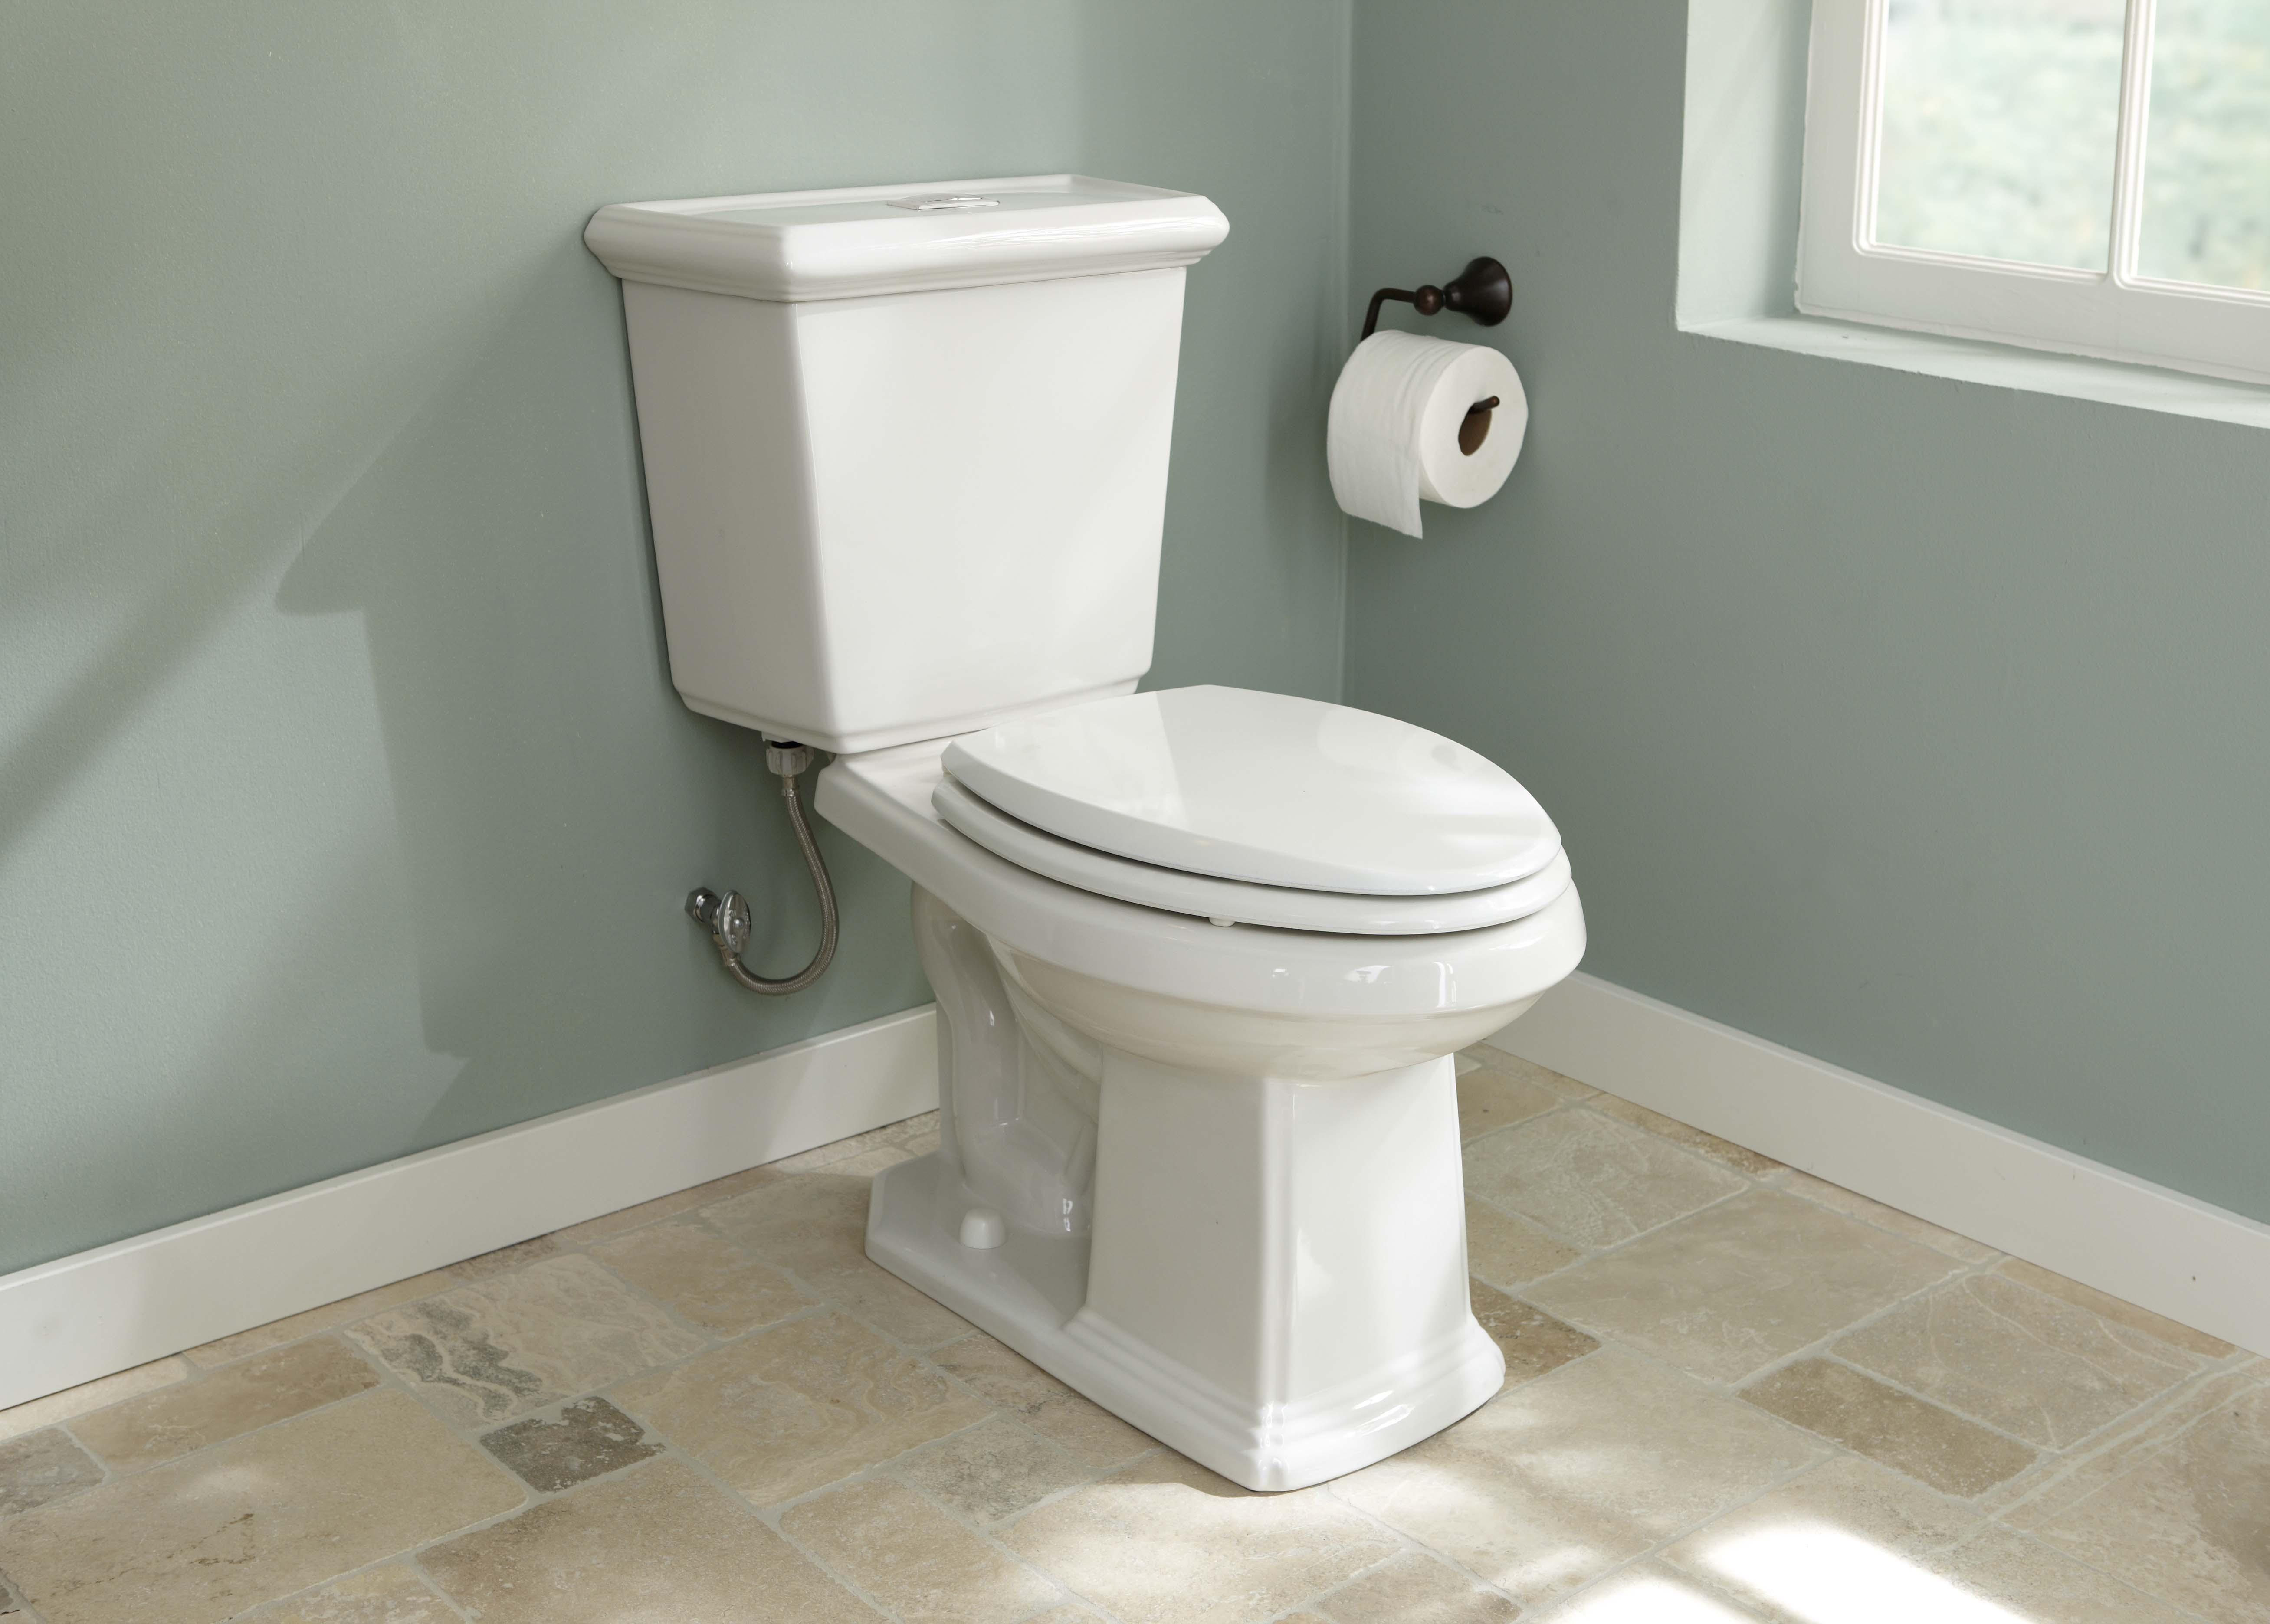 logan square™ dual flush  gpf  roughin twopiece  - logan square™ dual flush  gpf  roughin twopiece elongated toilet gerber plumbing